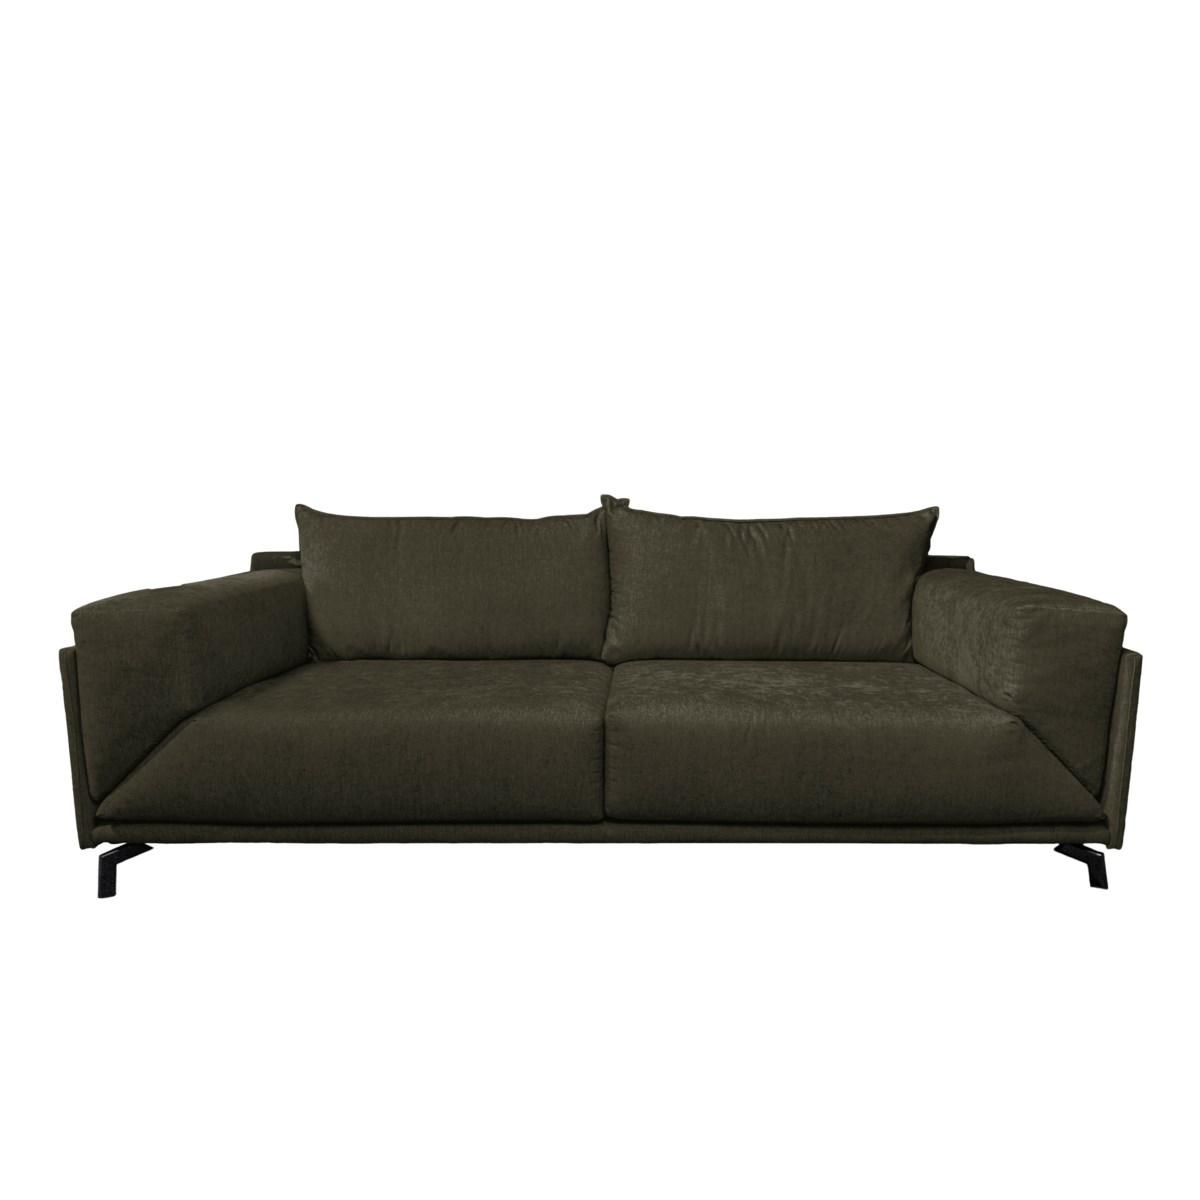 Verona Sofa 245 - Giant